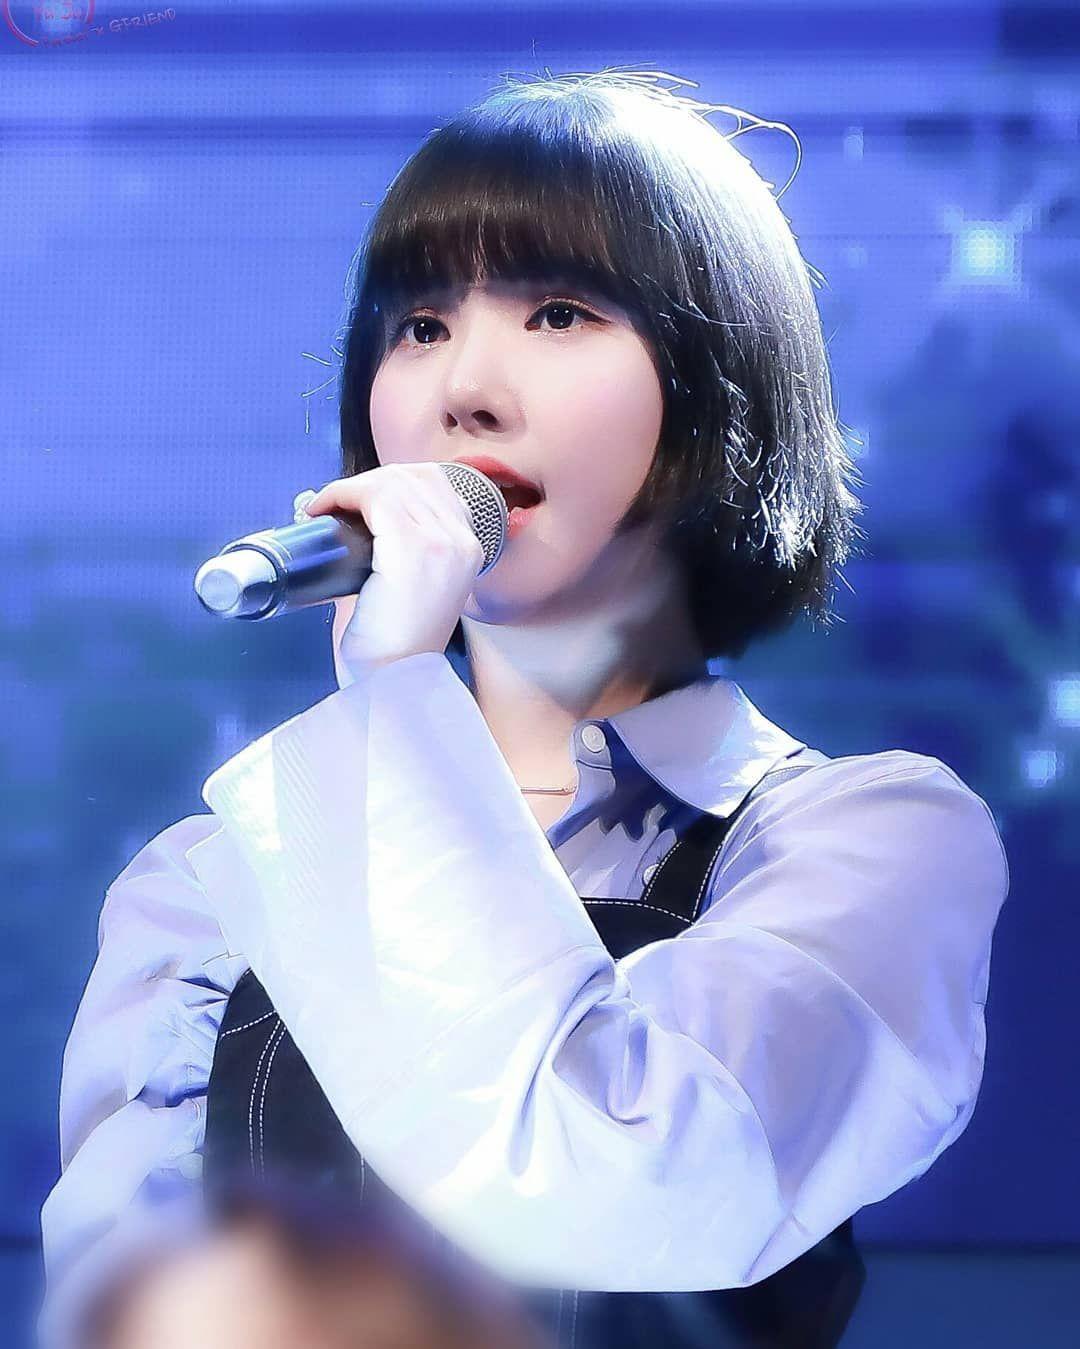 Pin By David Padilla On Eunha Jung Eunbi K Pop Music Musical Group Korean Singer